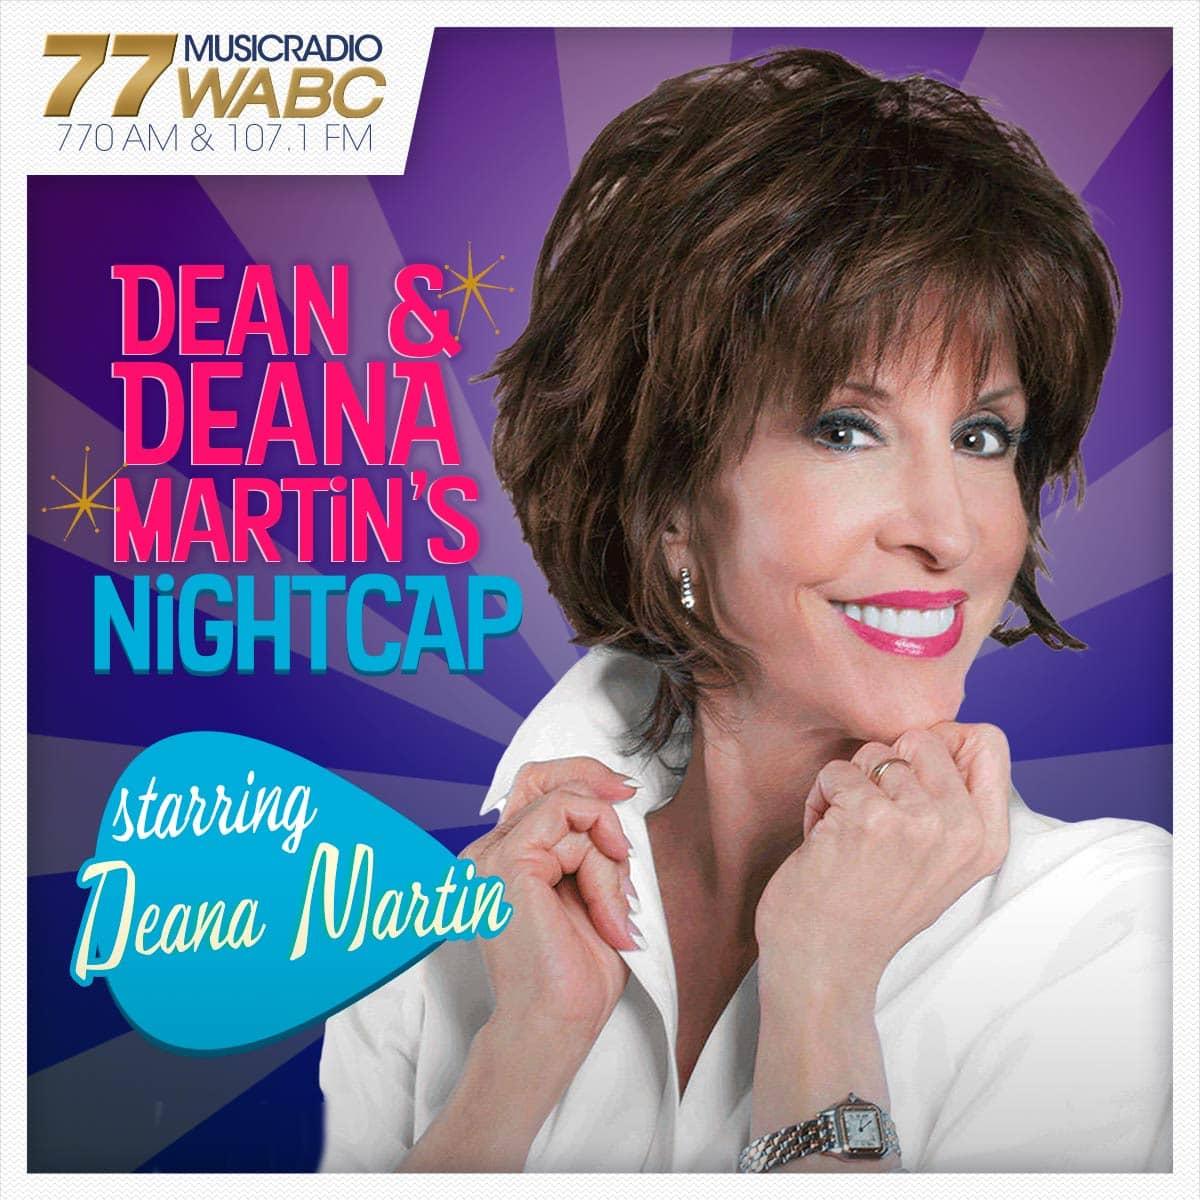 Dean & Deanna Martin Night Cap Starring Deana Martin